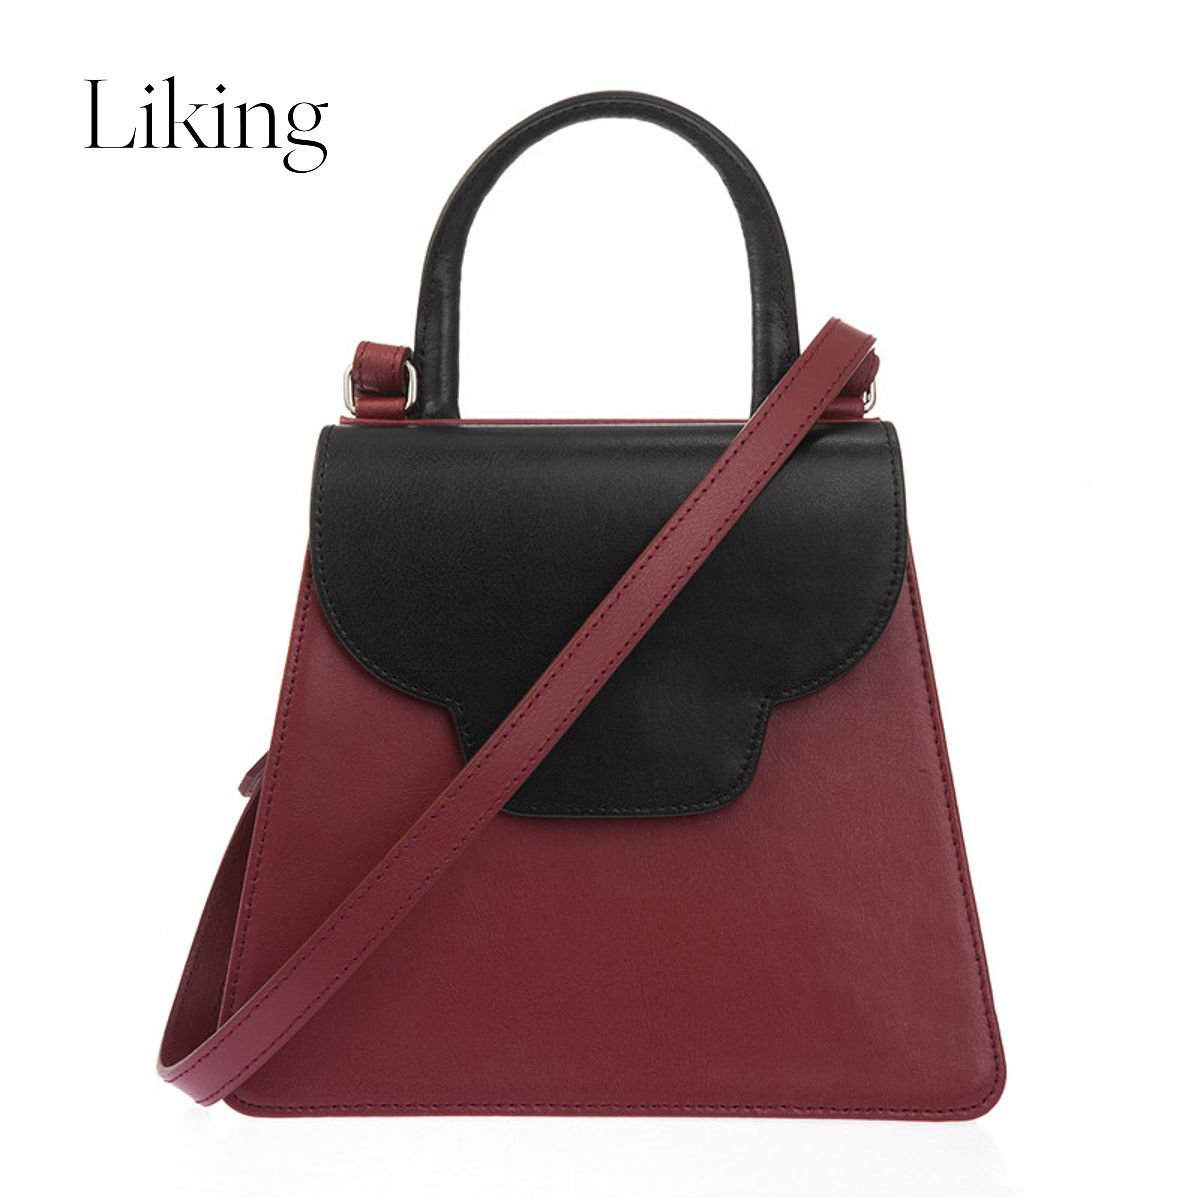 Atelier Park 女士红色拼黑色牛皮挎包 ALBBG01 04 Red Black